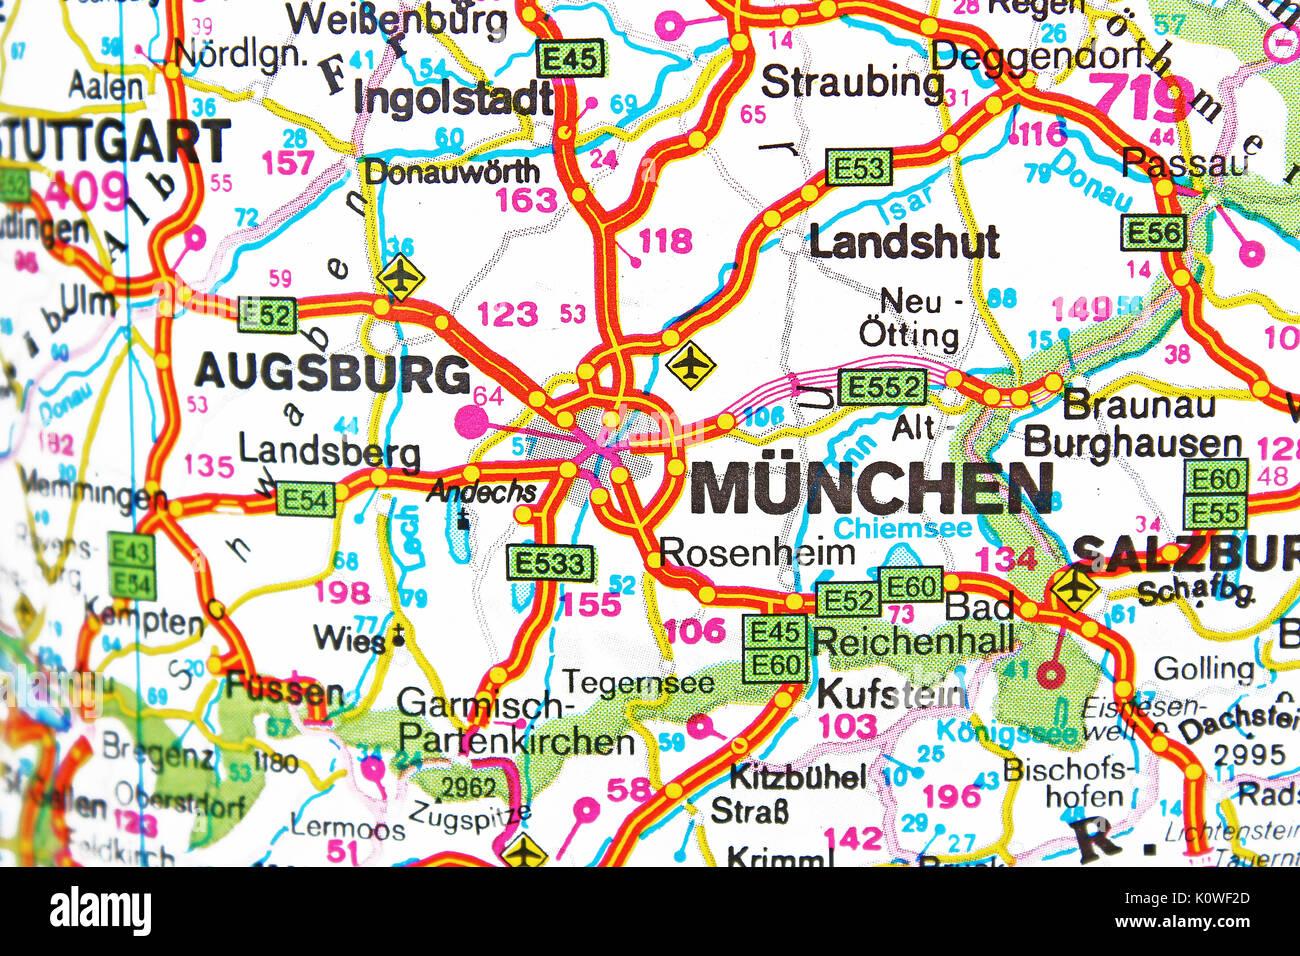 München Munich Munchen map city map road map Stock Photo ...